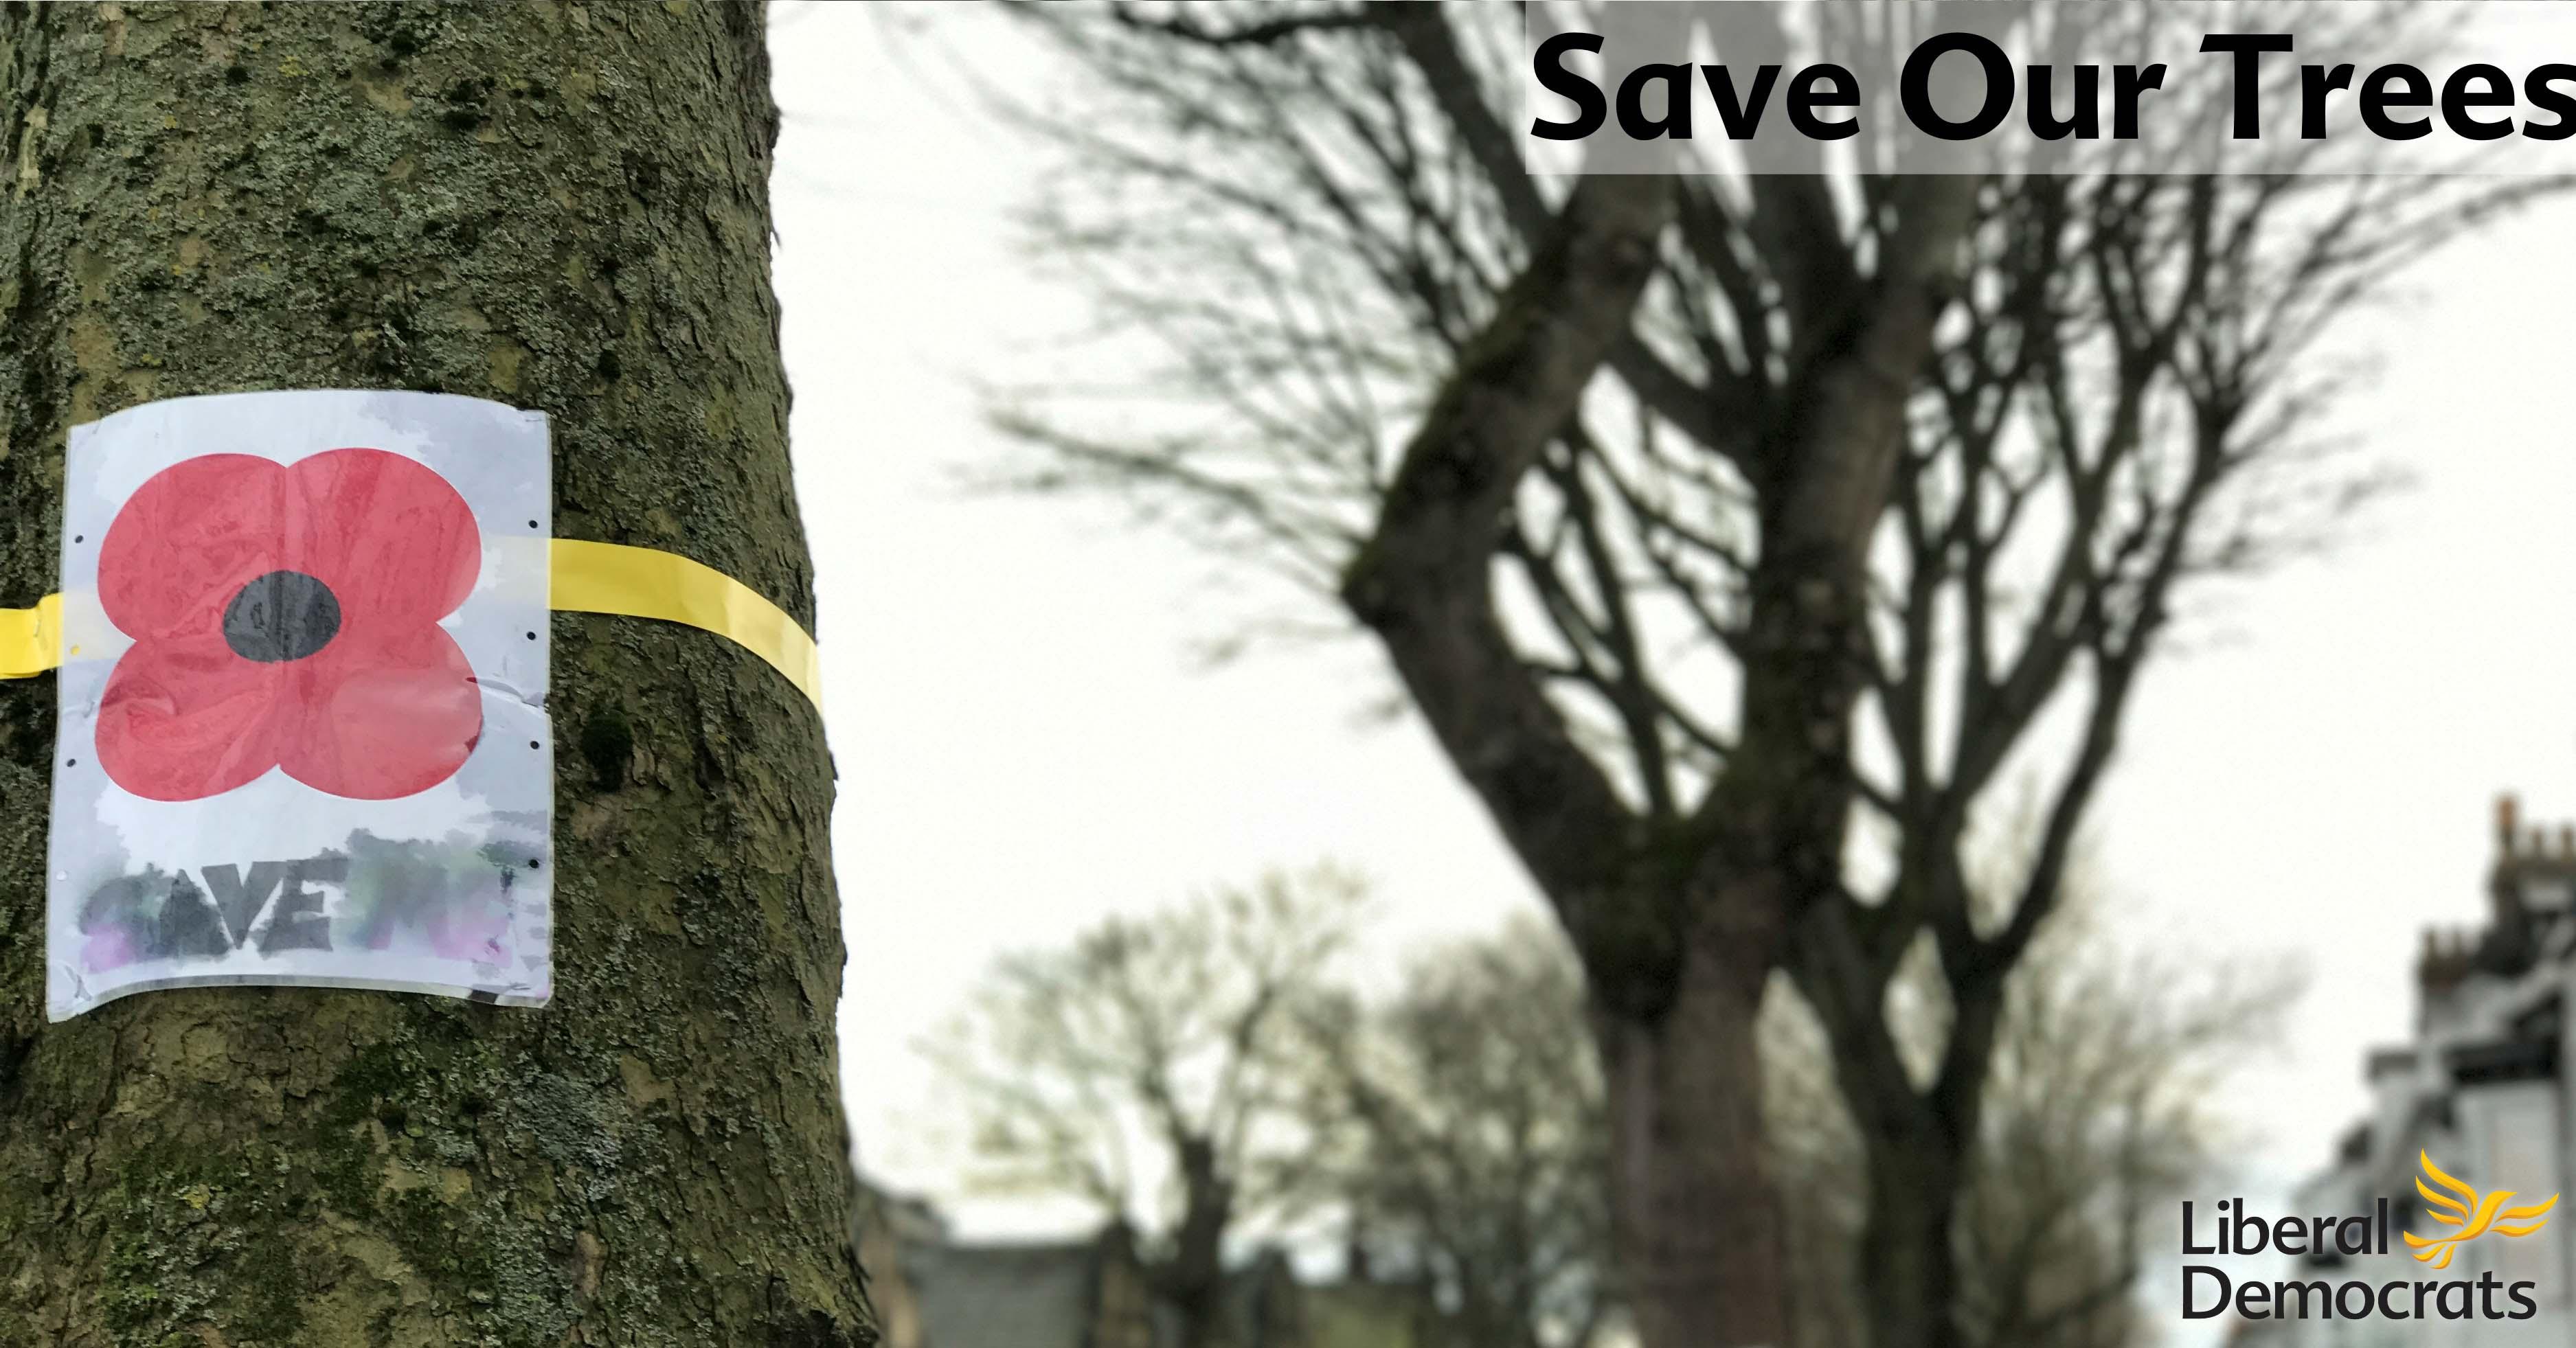 Statement On Tree Hearing